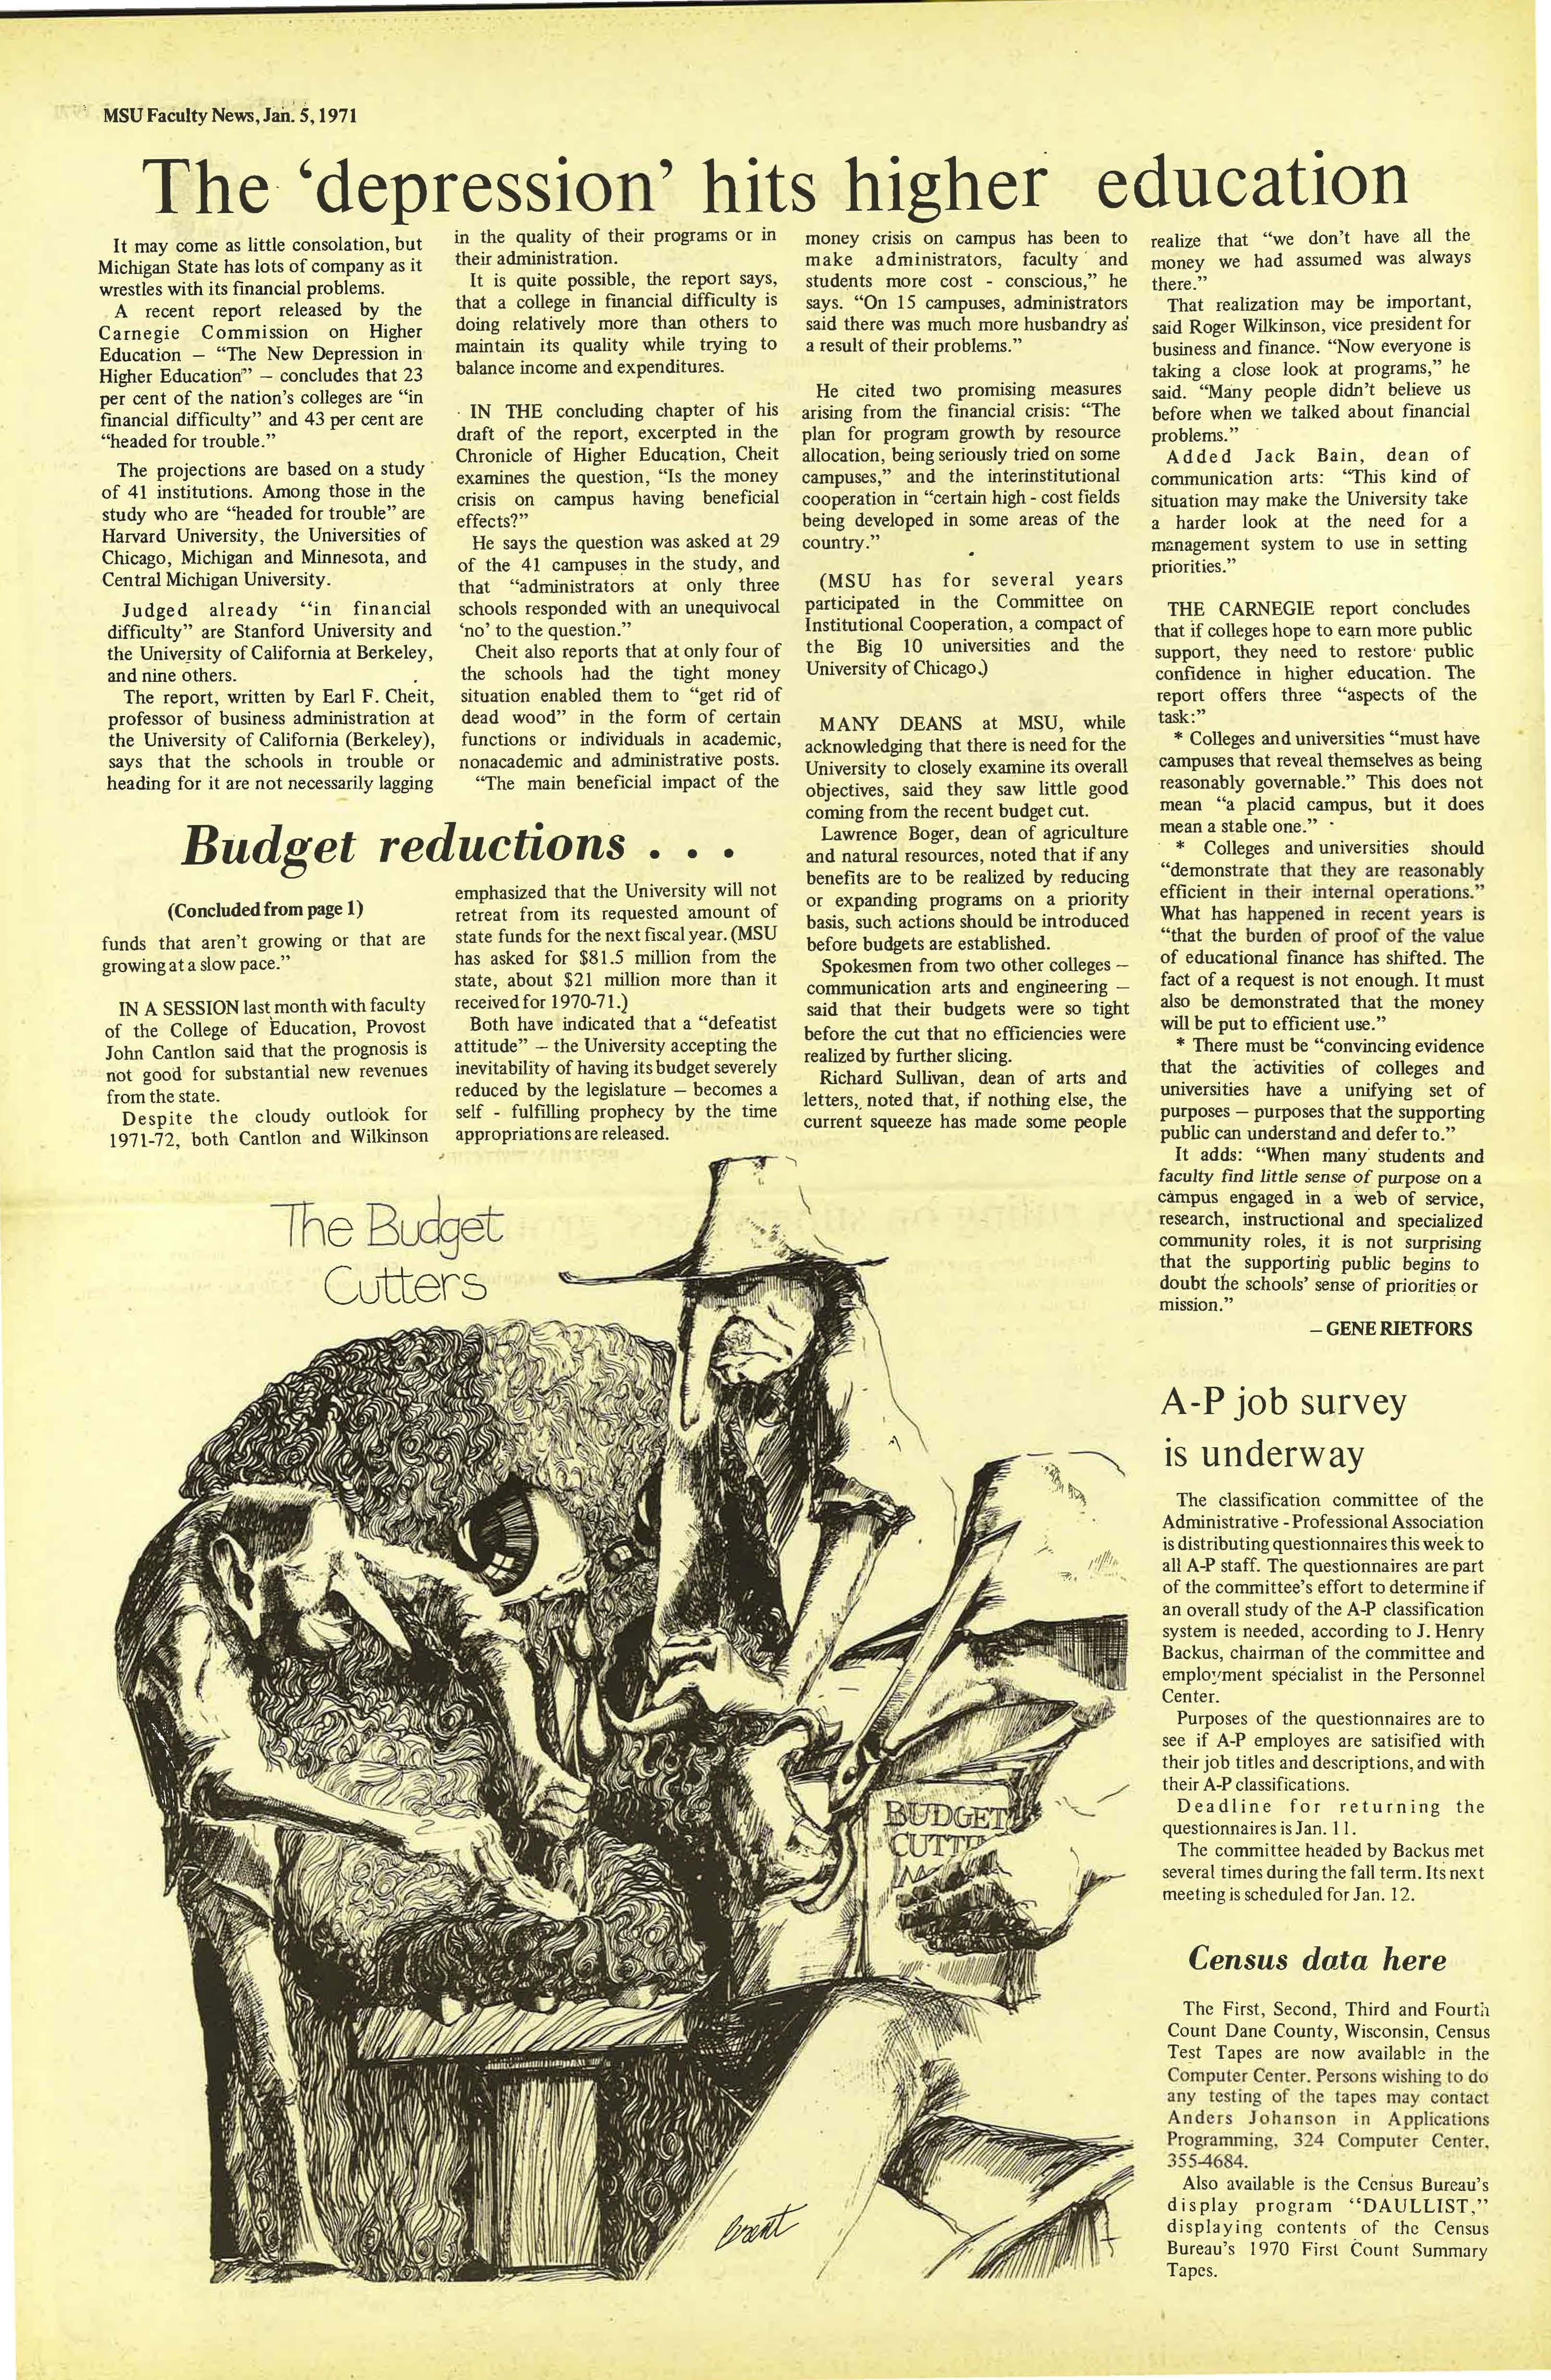 MSU News Bulletin, vol. 3, No. 6, October 28, 1971